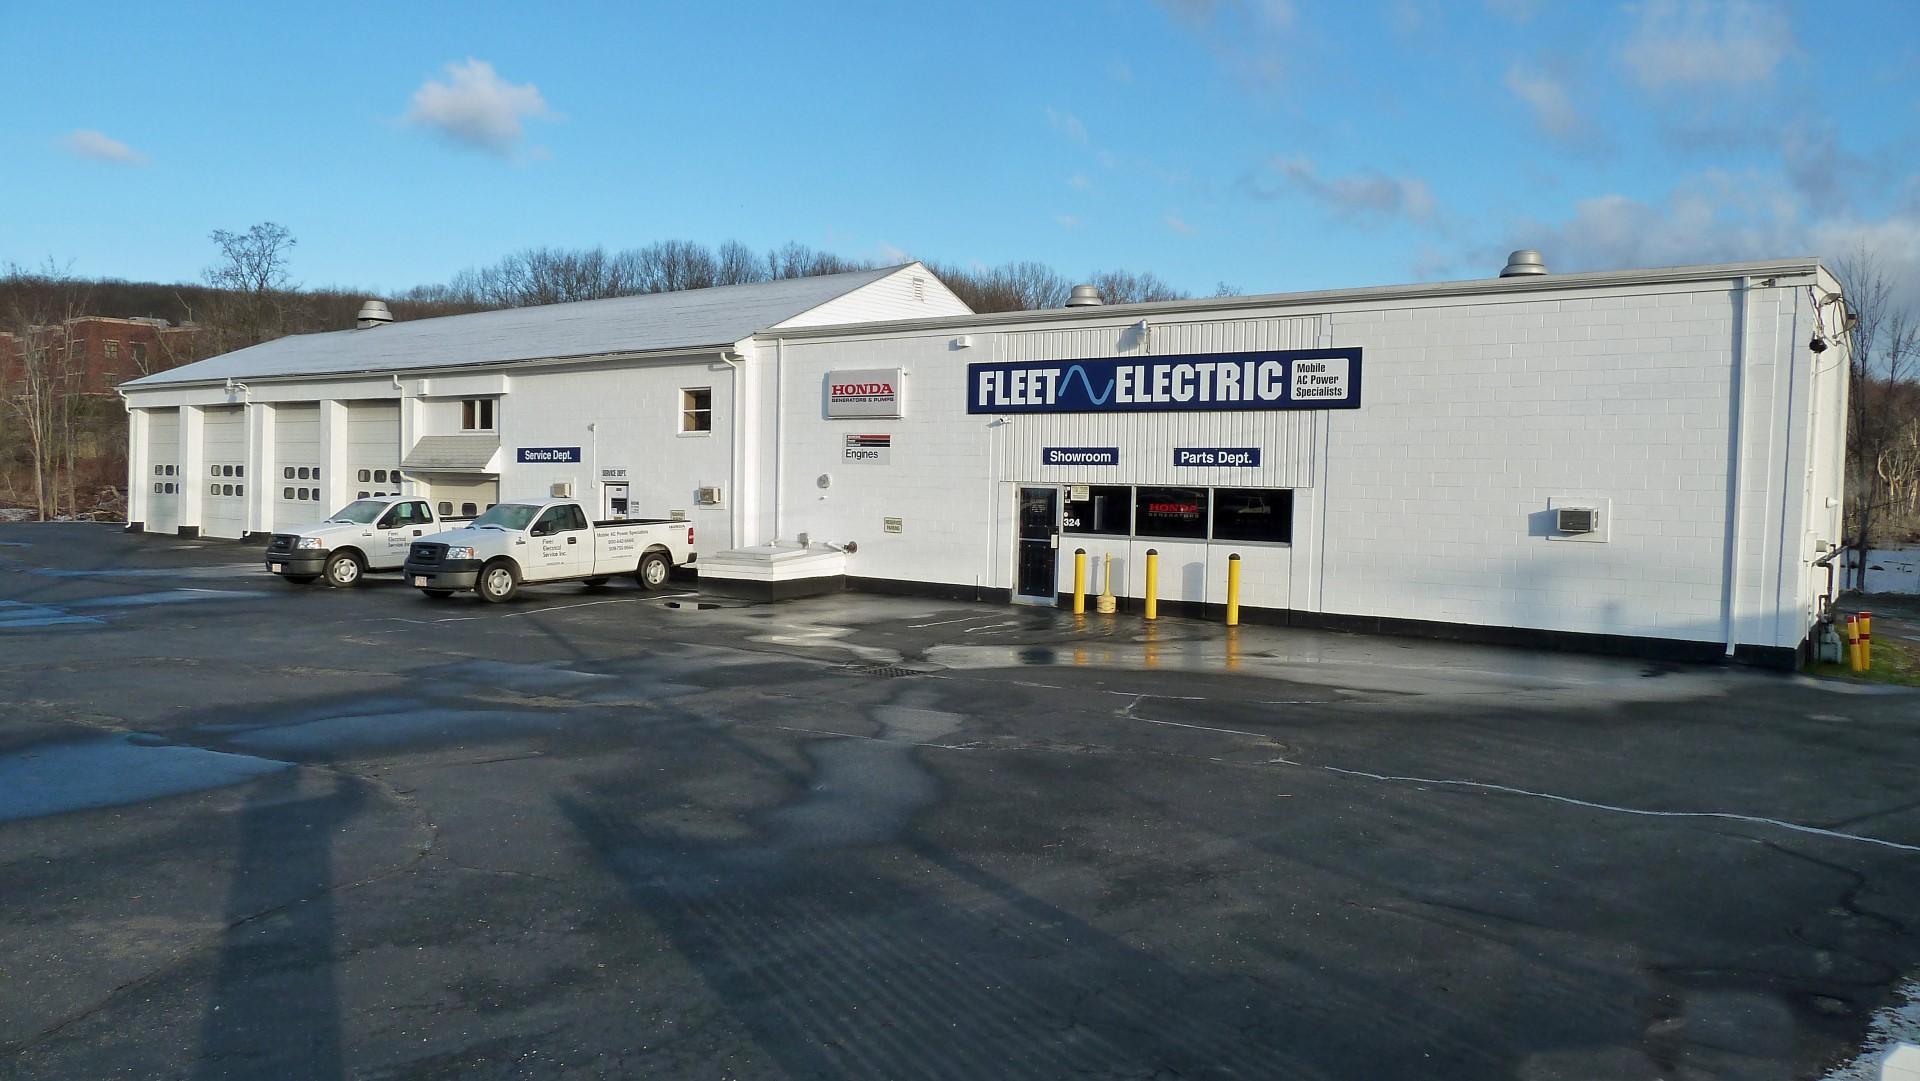 Fleet Electric Worcester, MA